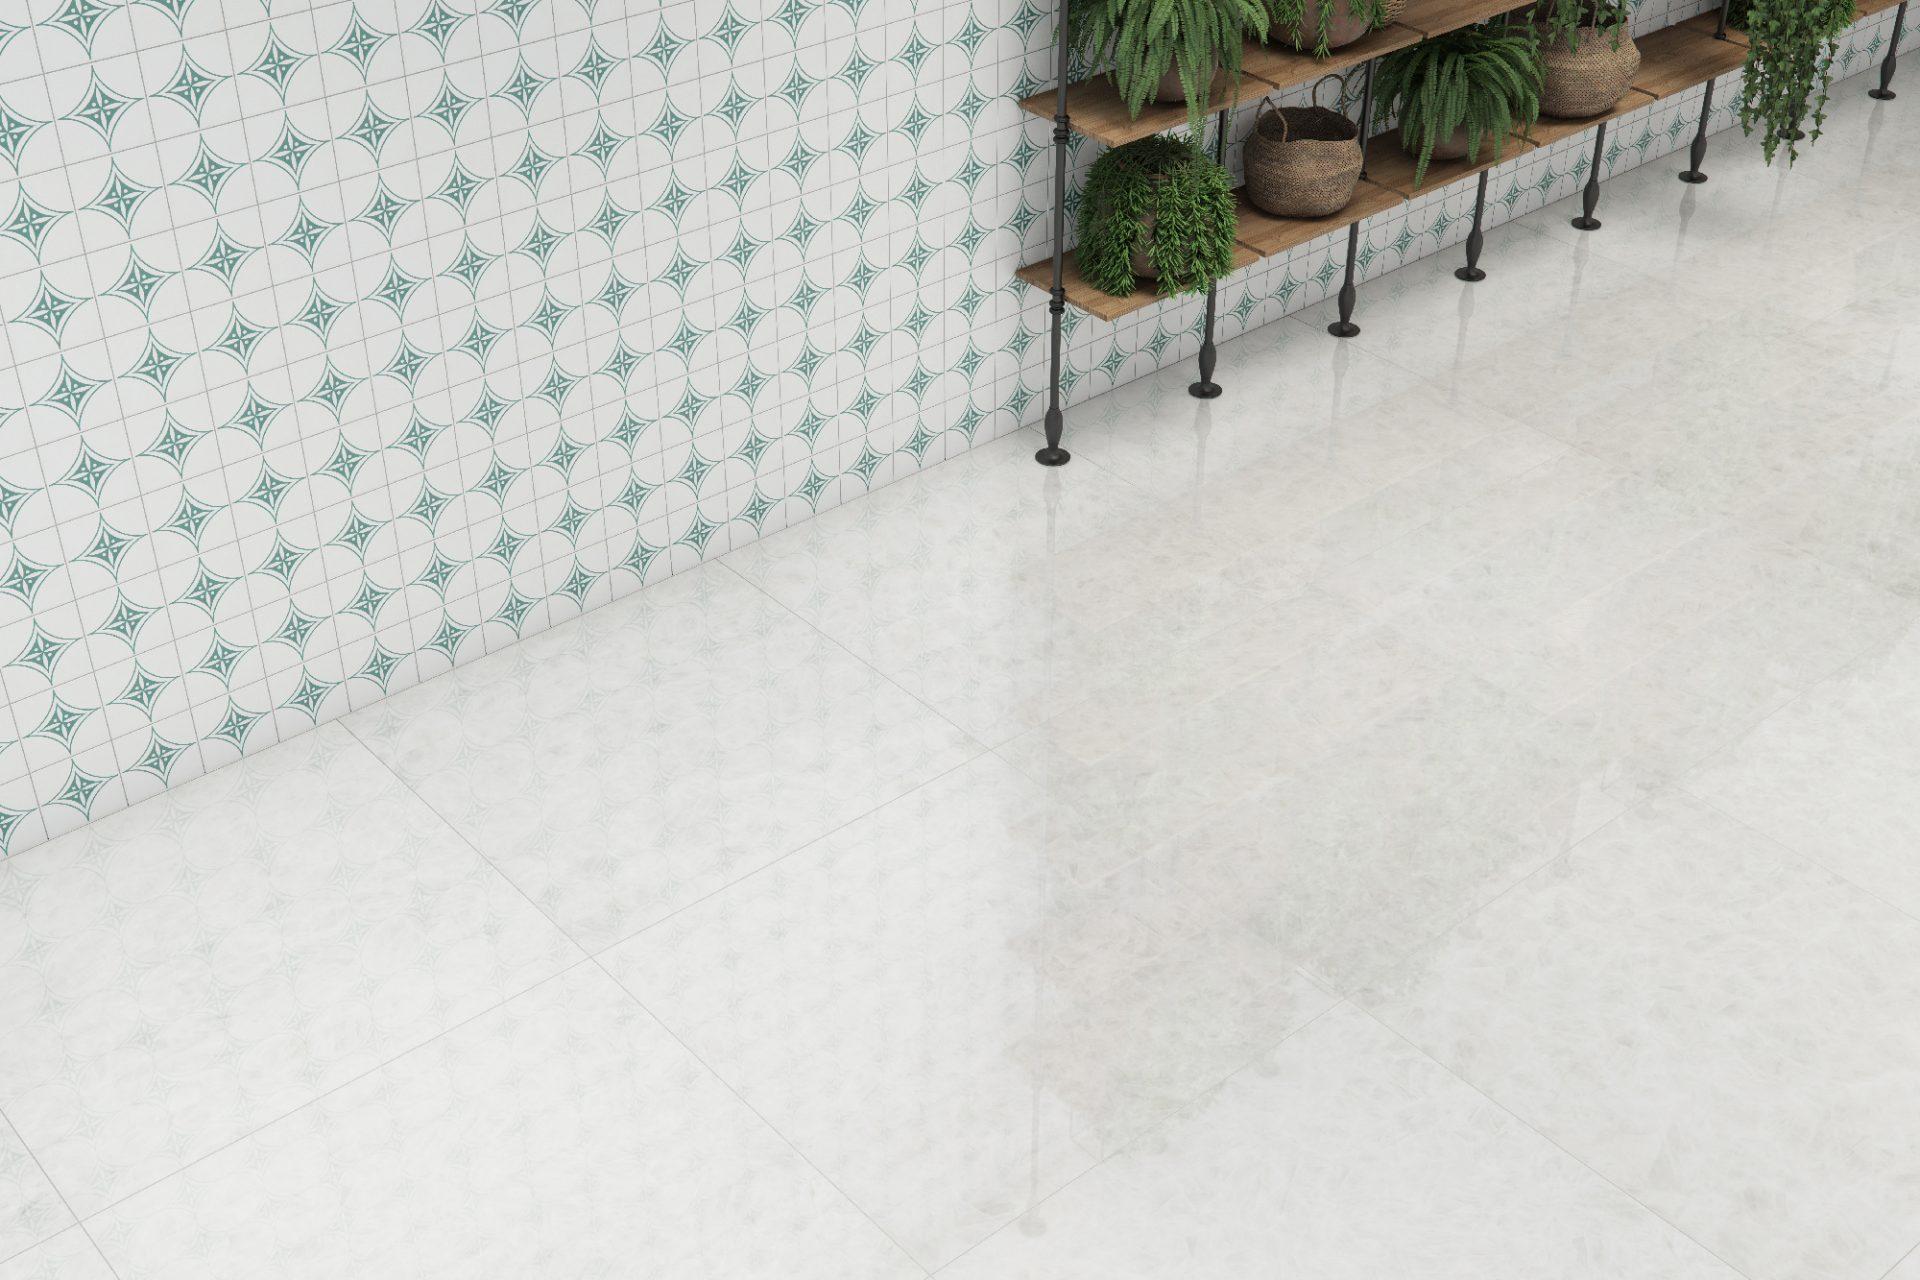 Crystal Quartzo PO 90x90cm – Sidereal Green AC 15x15cm